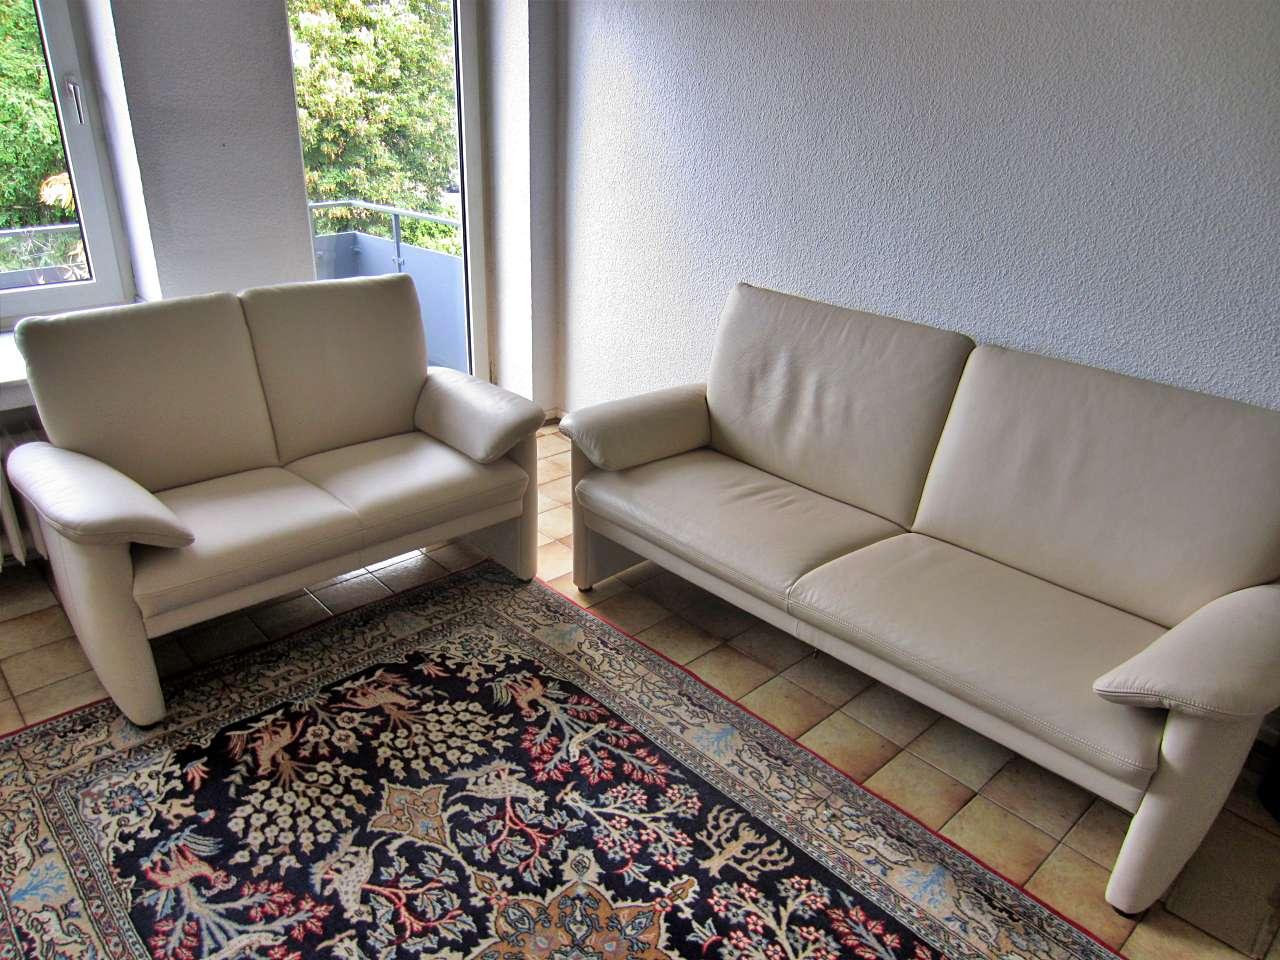 Couchgarnitur Sofa 3er 2er Leder weiss